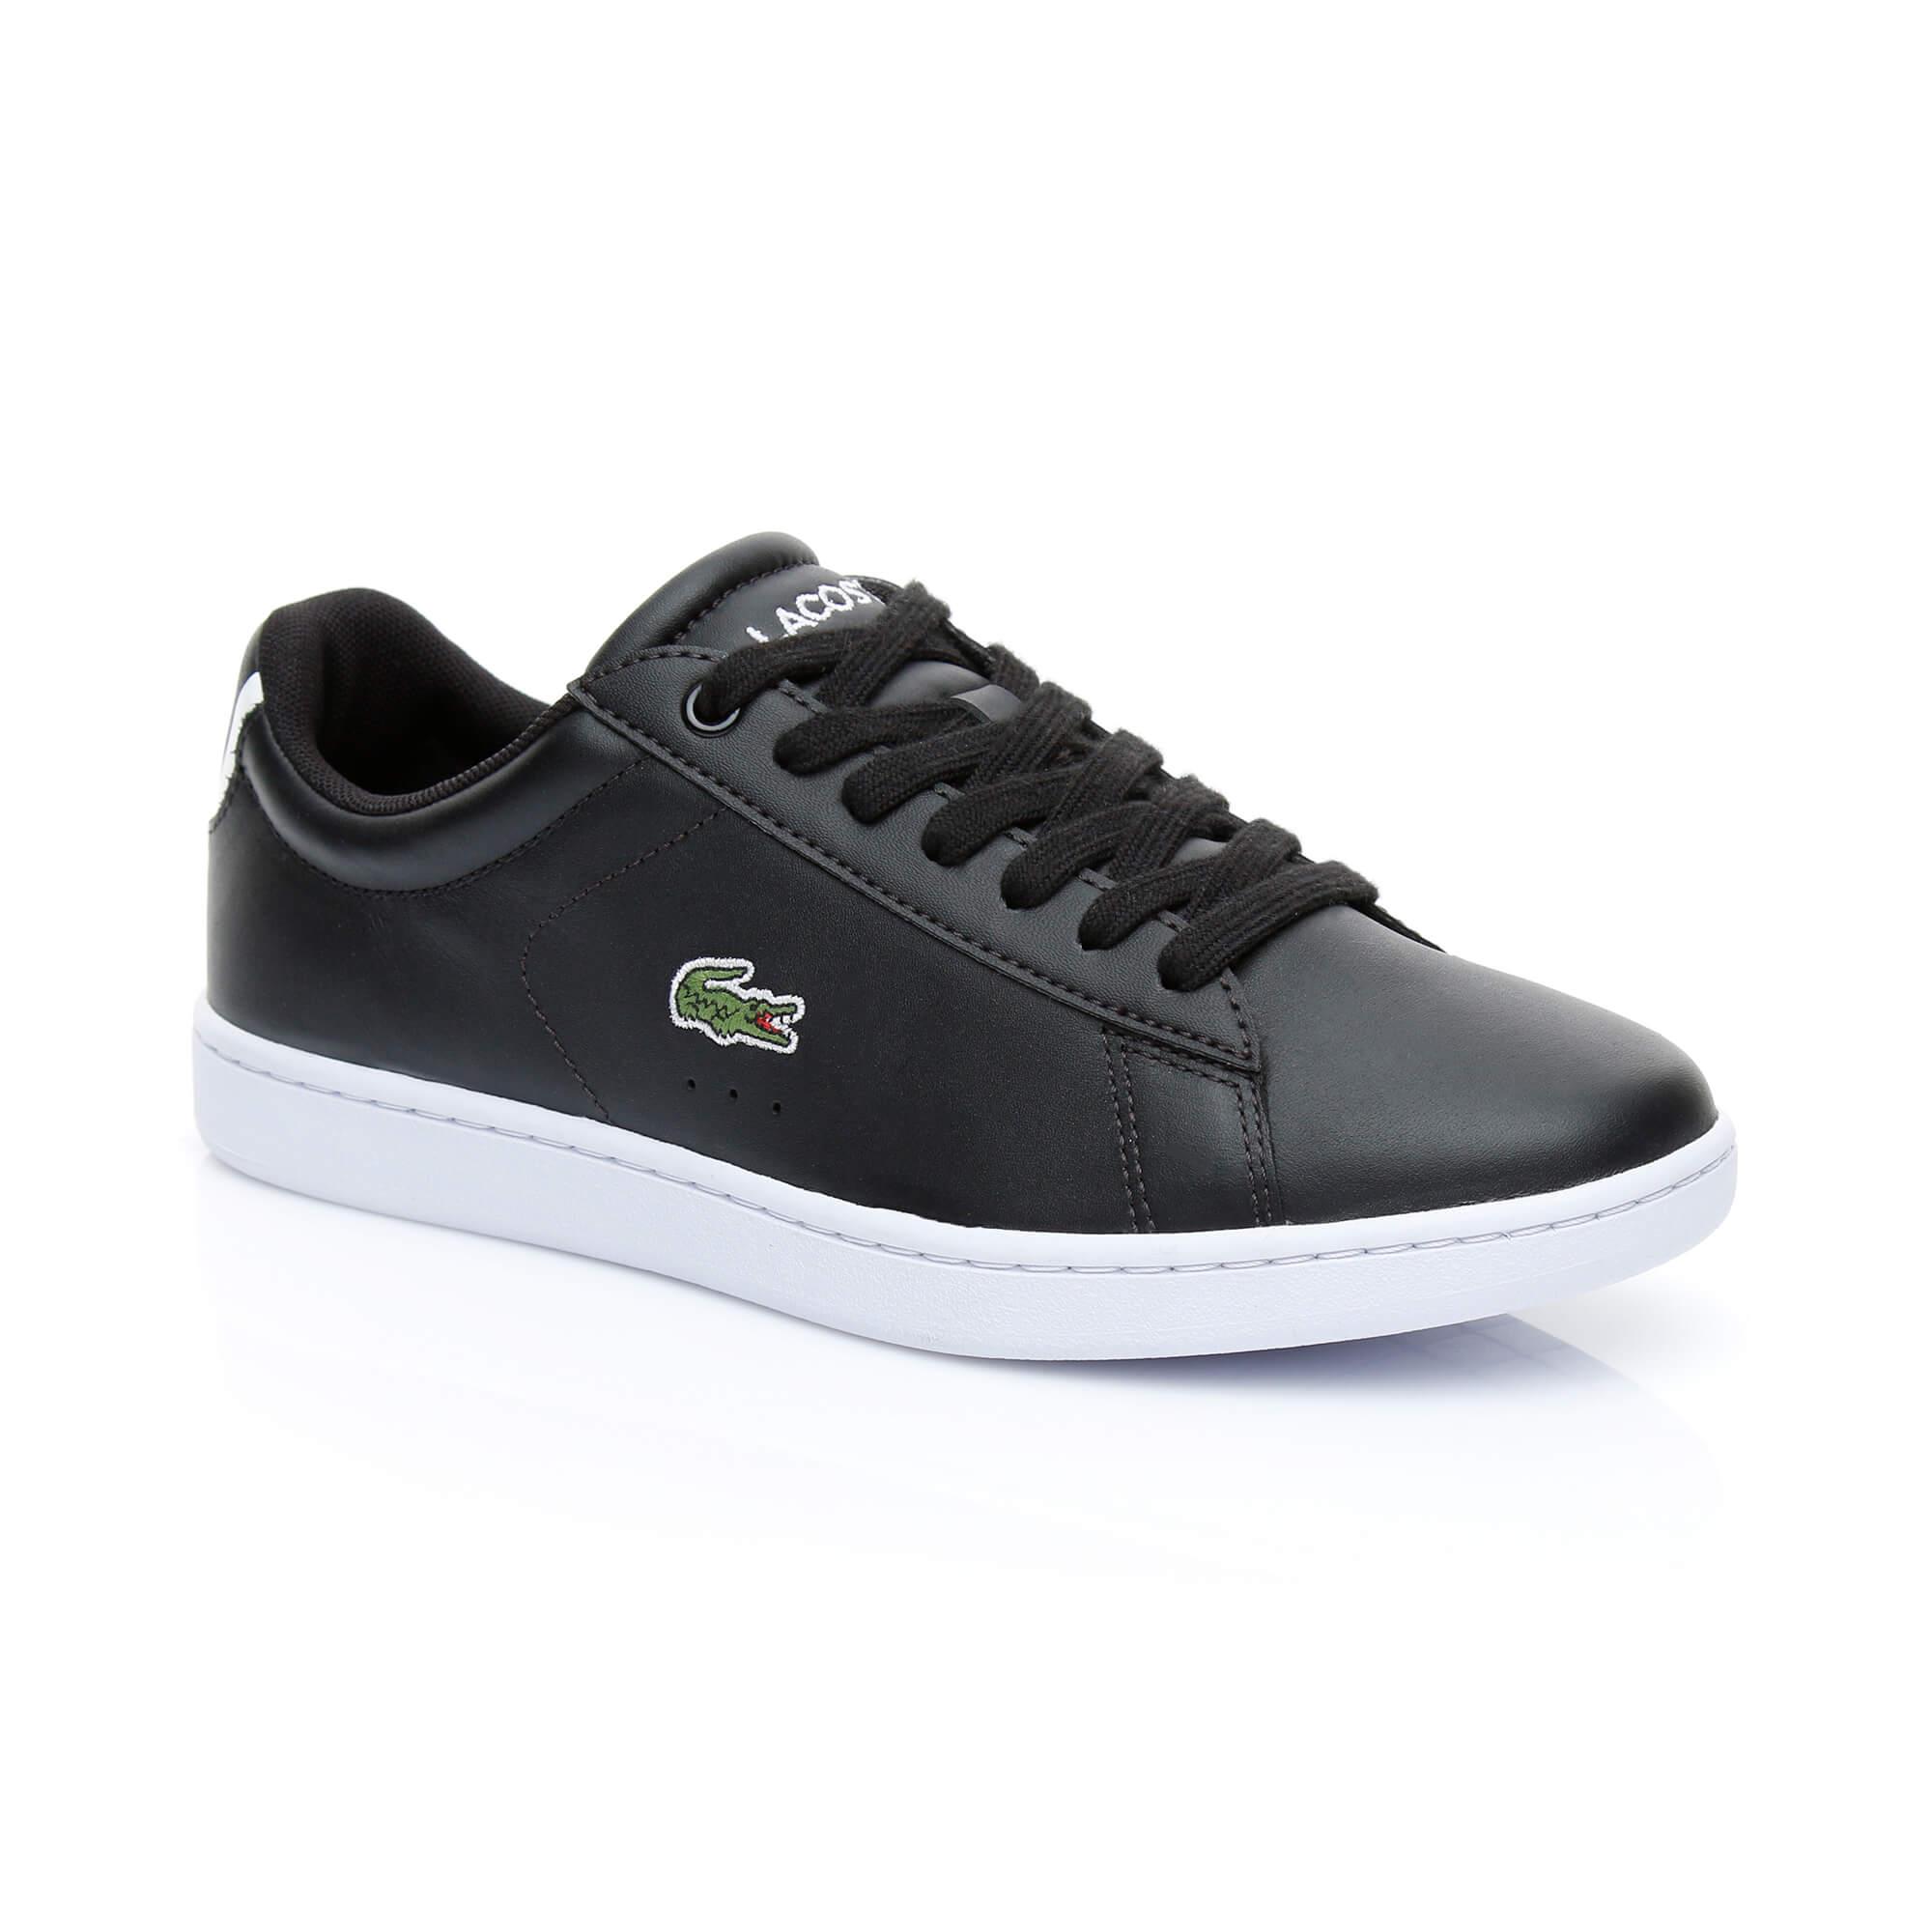 Lacoste Carnaby Evo BL 1 Damskie Sneakersy